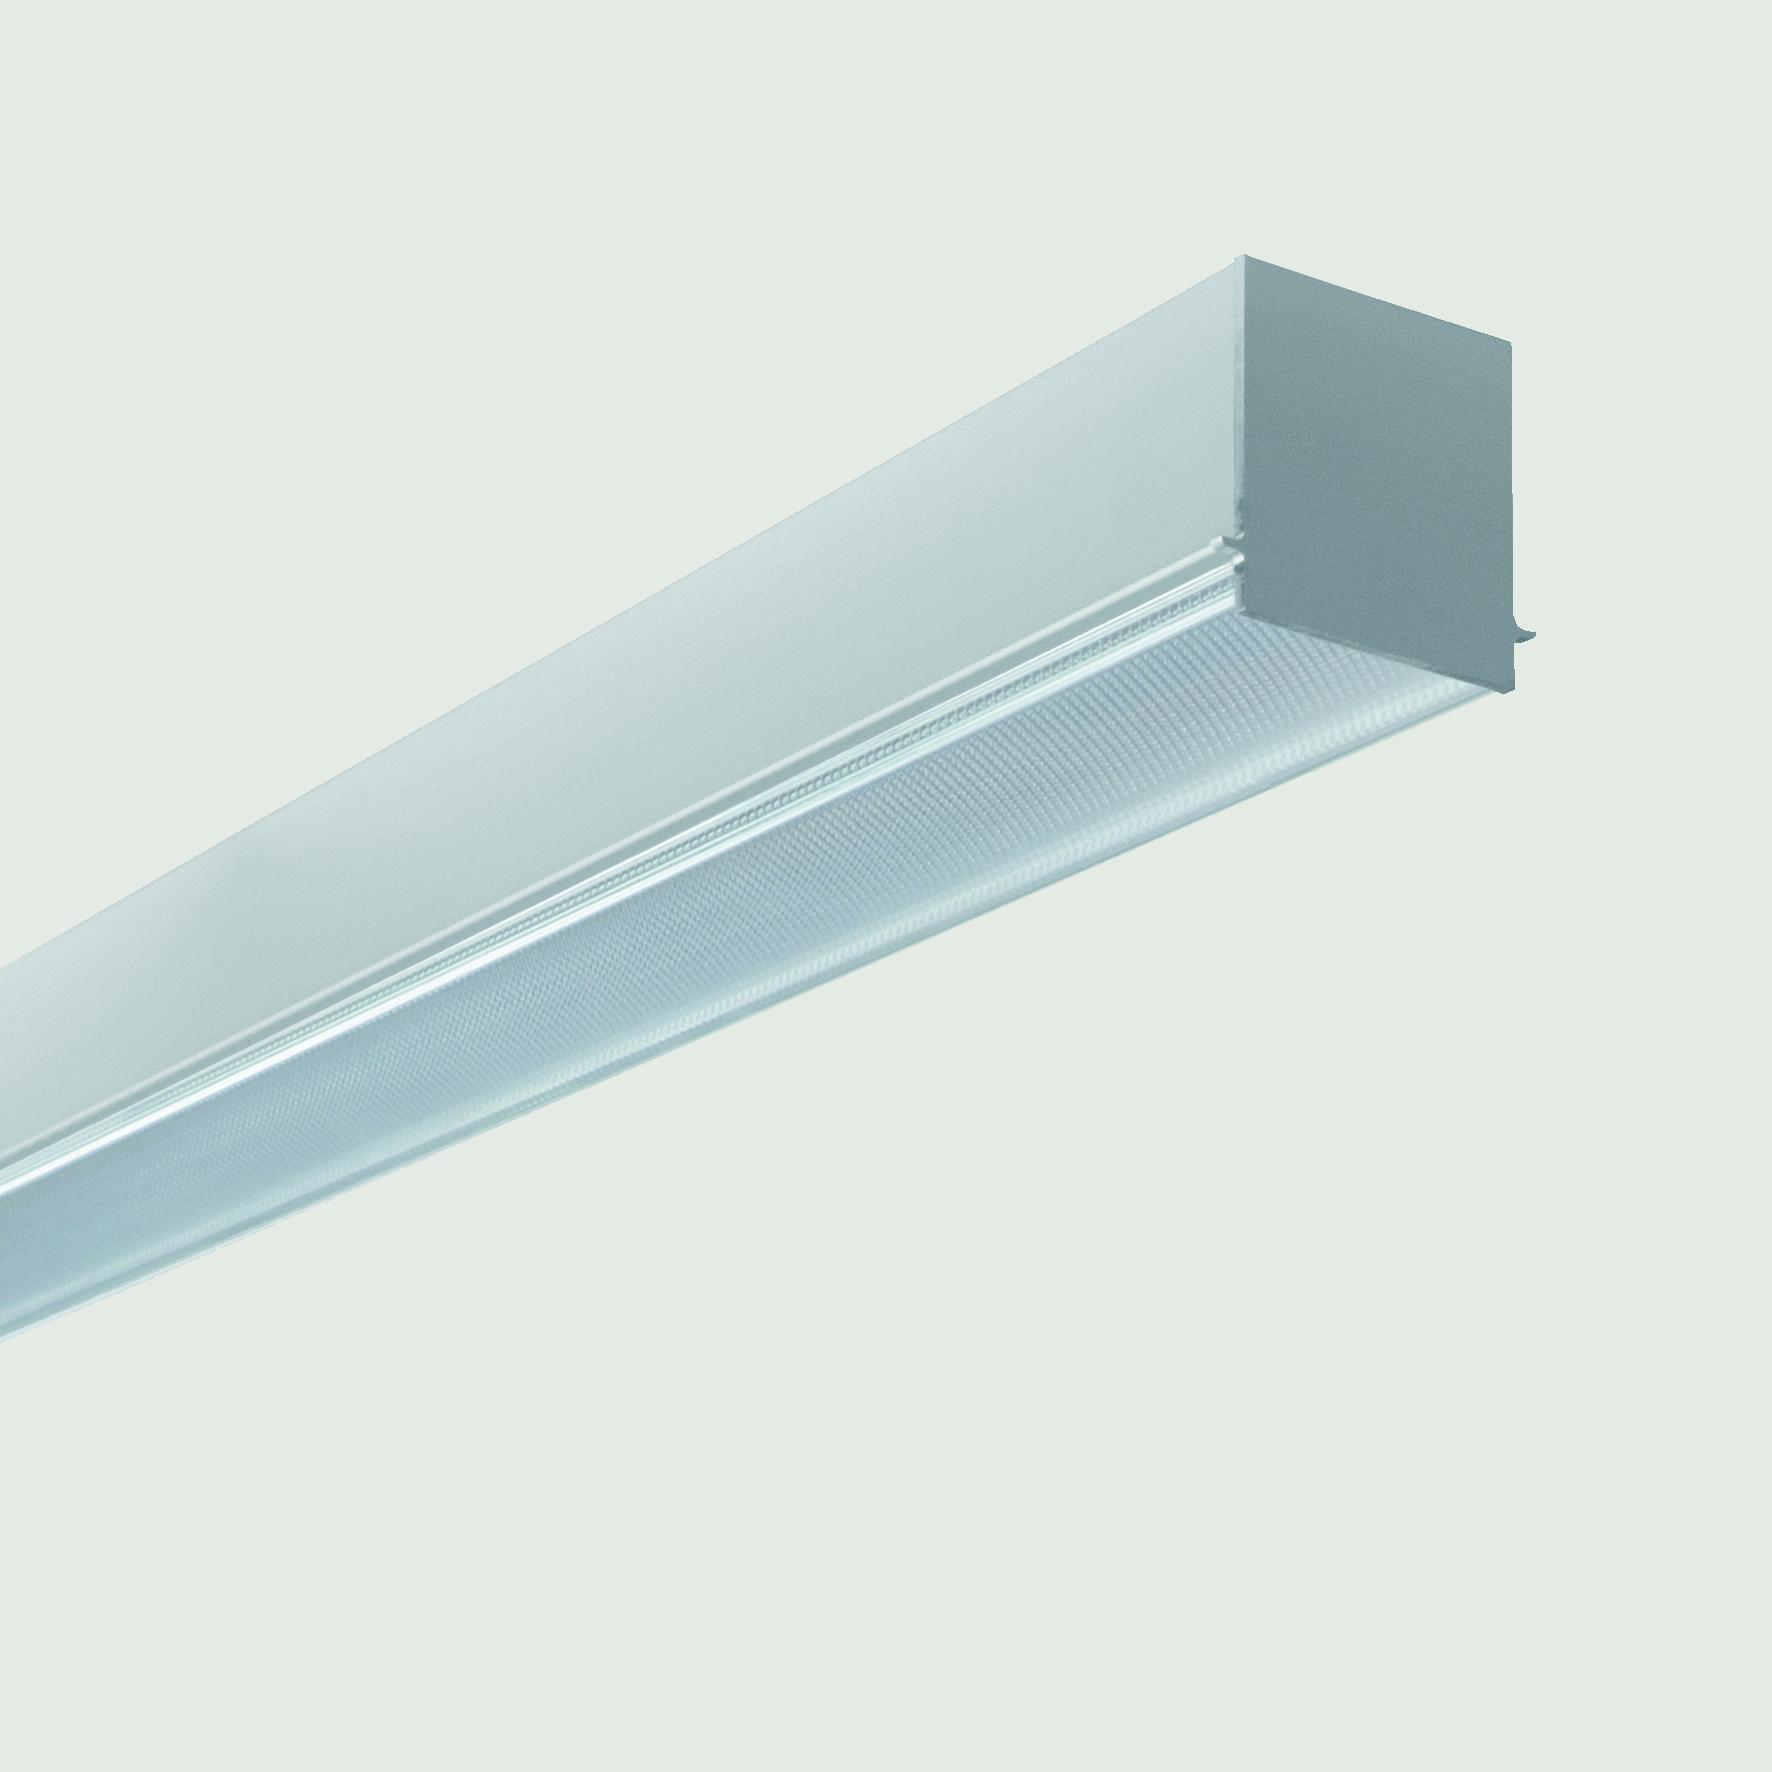 SE40FU-profilleuchte-silber-sml-led-1